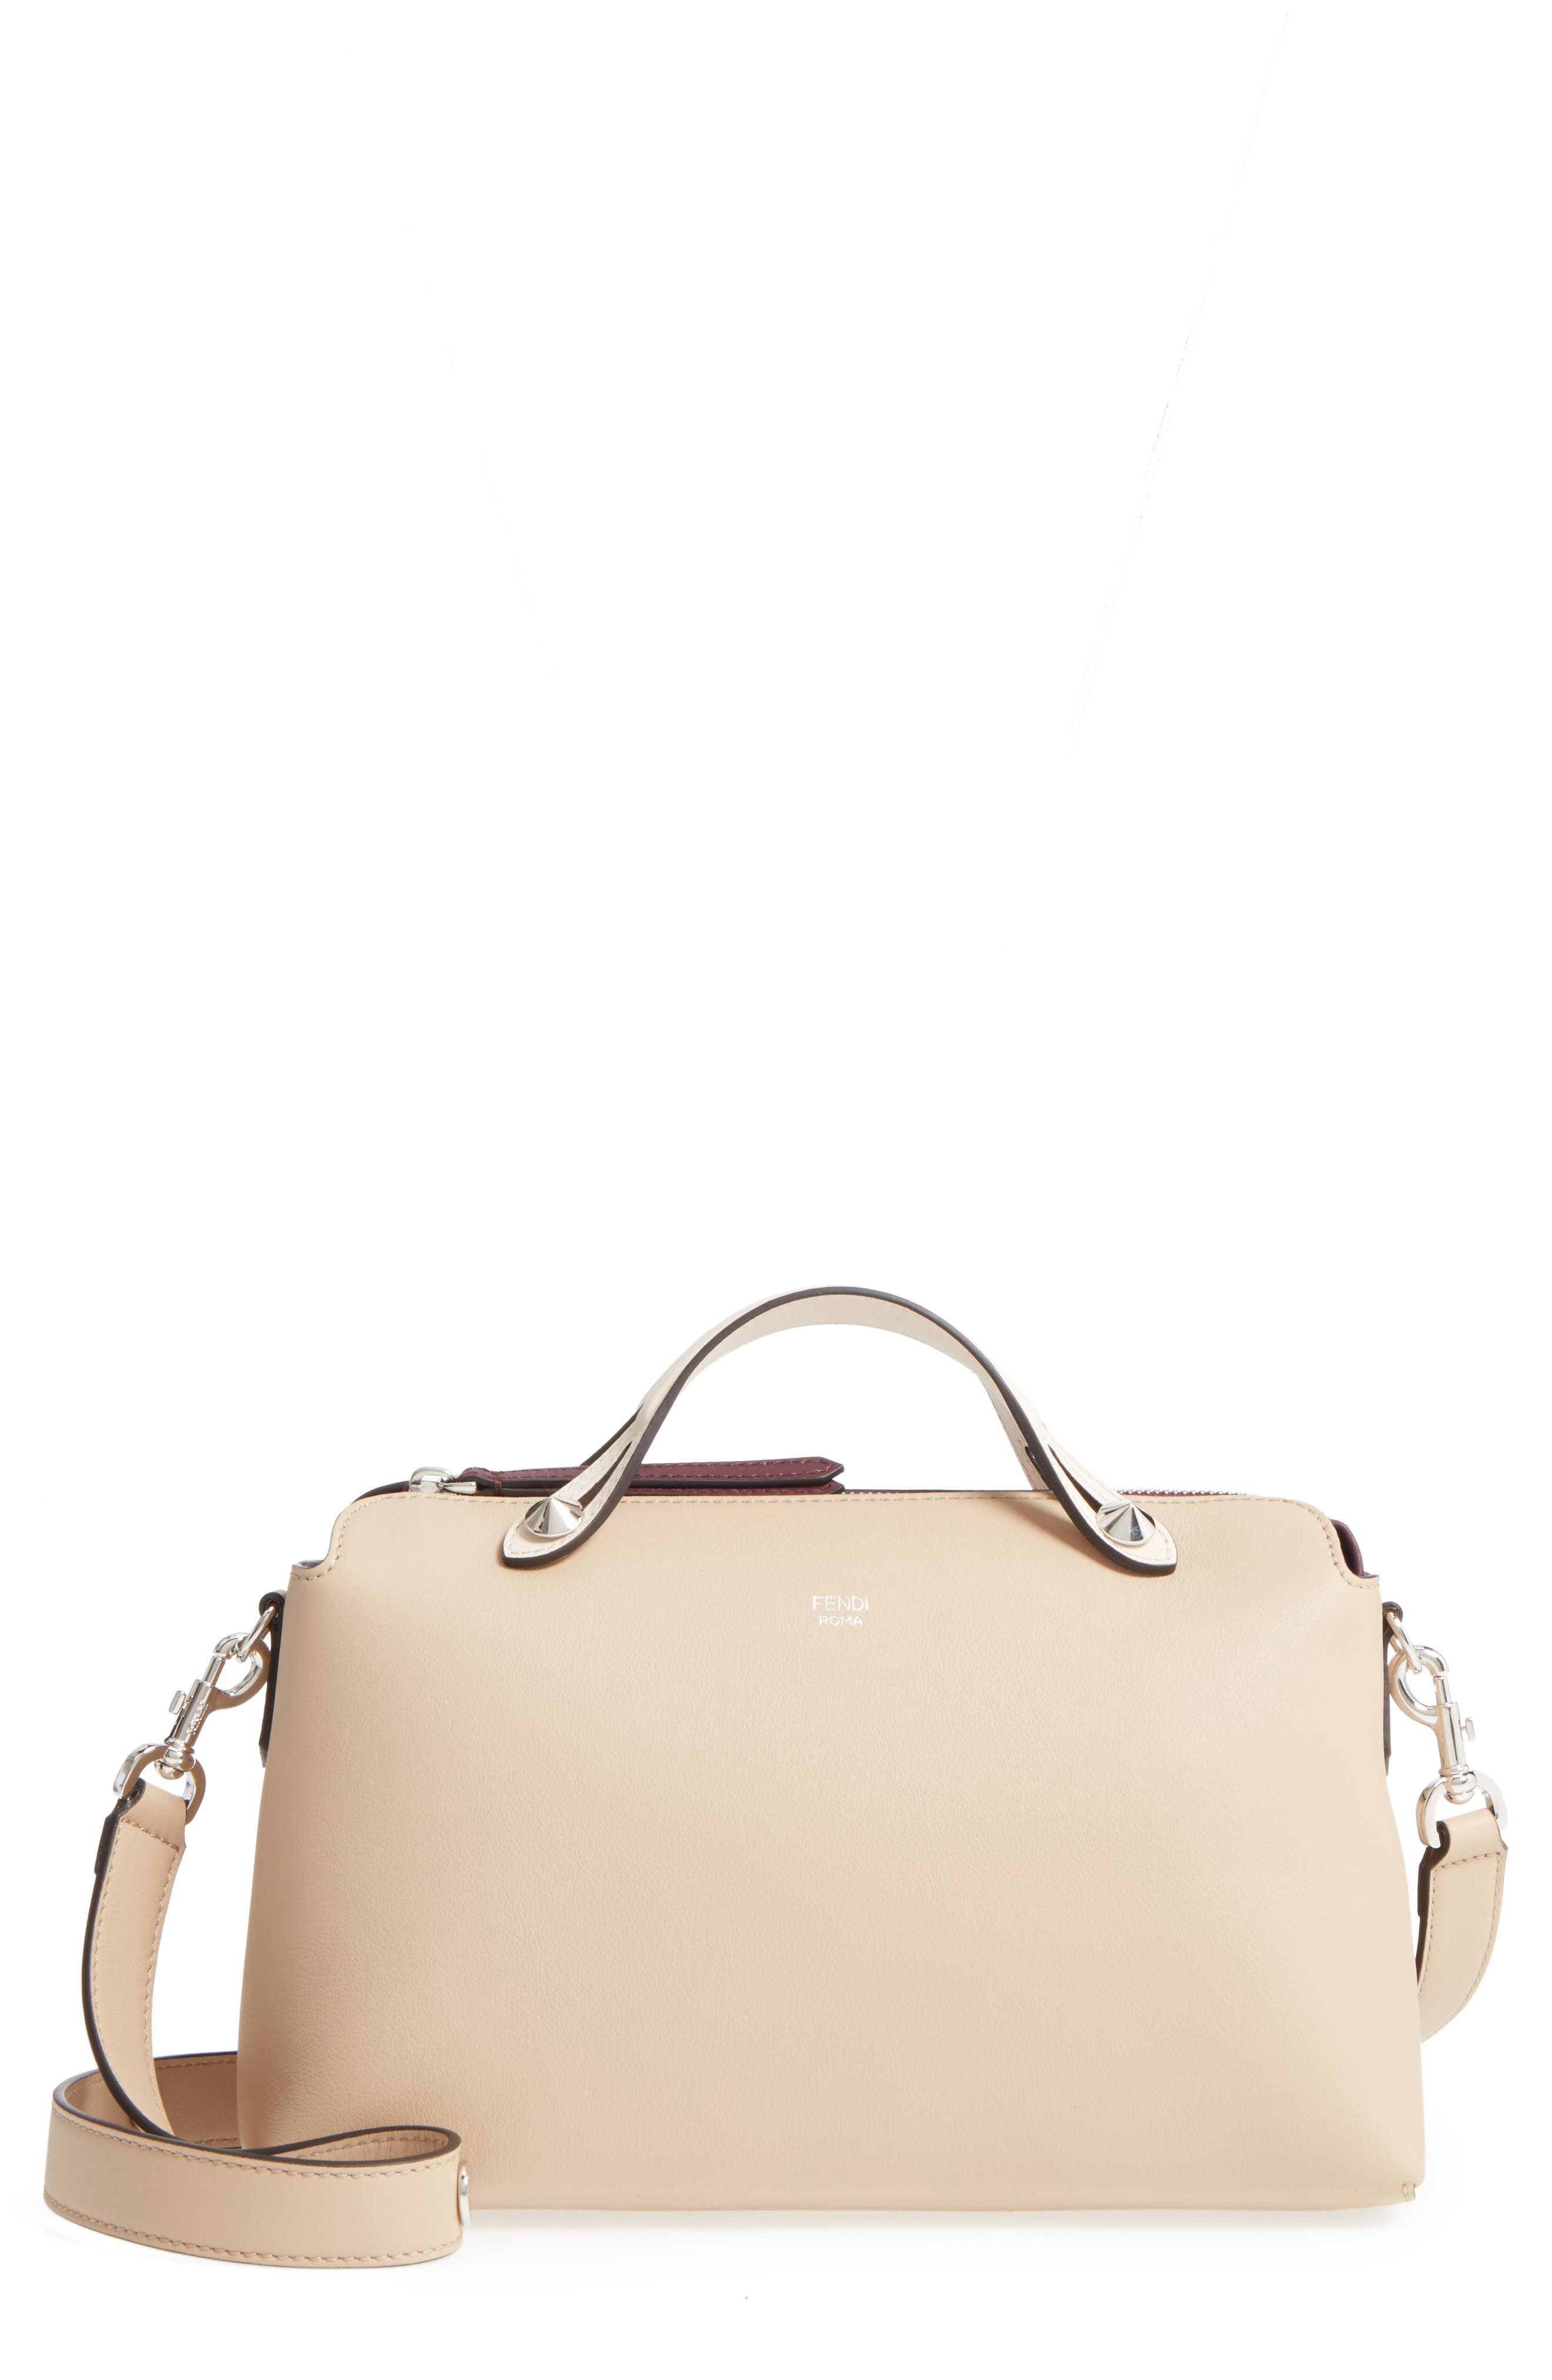 Main Image - Fendi 'Medium By the Way' Colorblock Leather Shoulder Bag